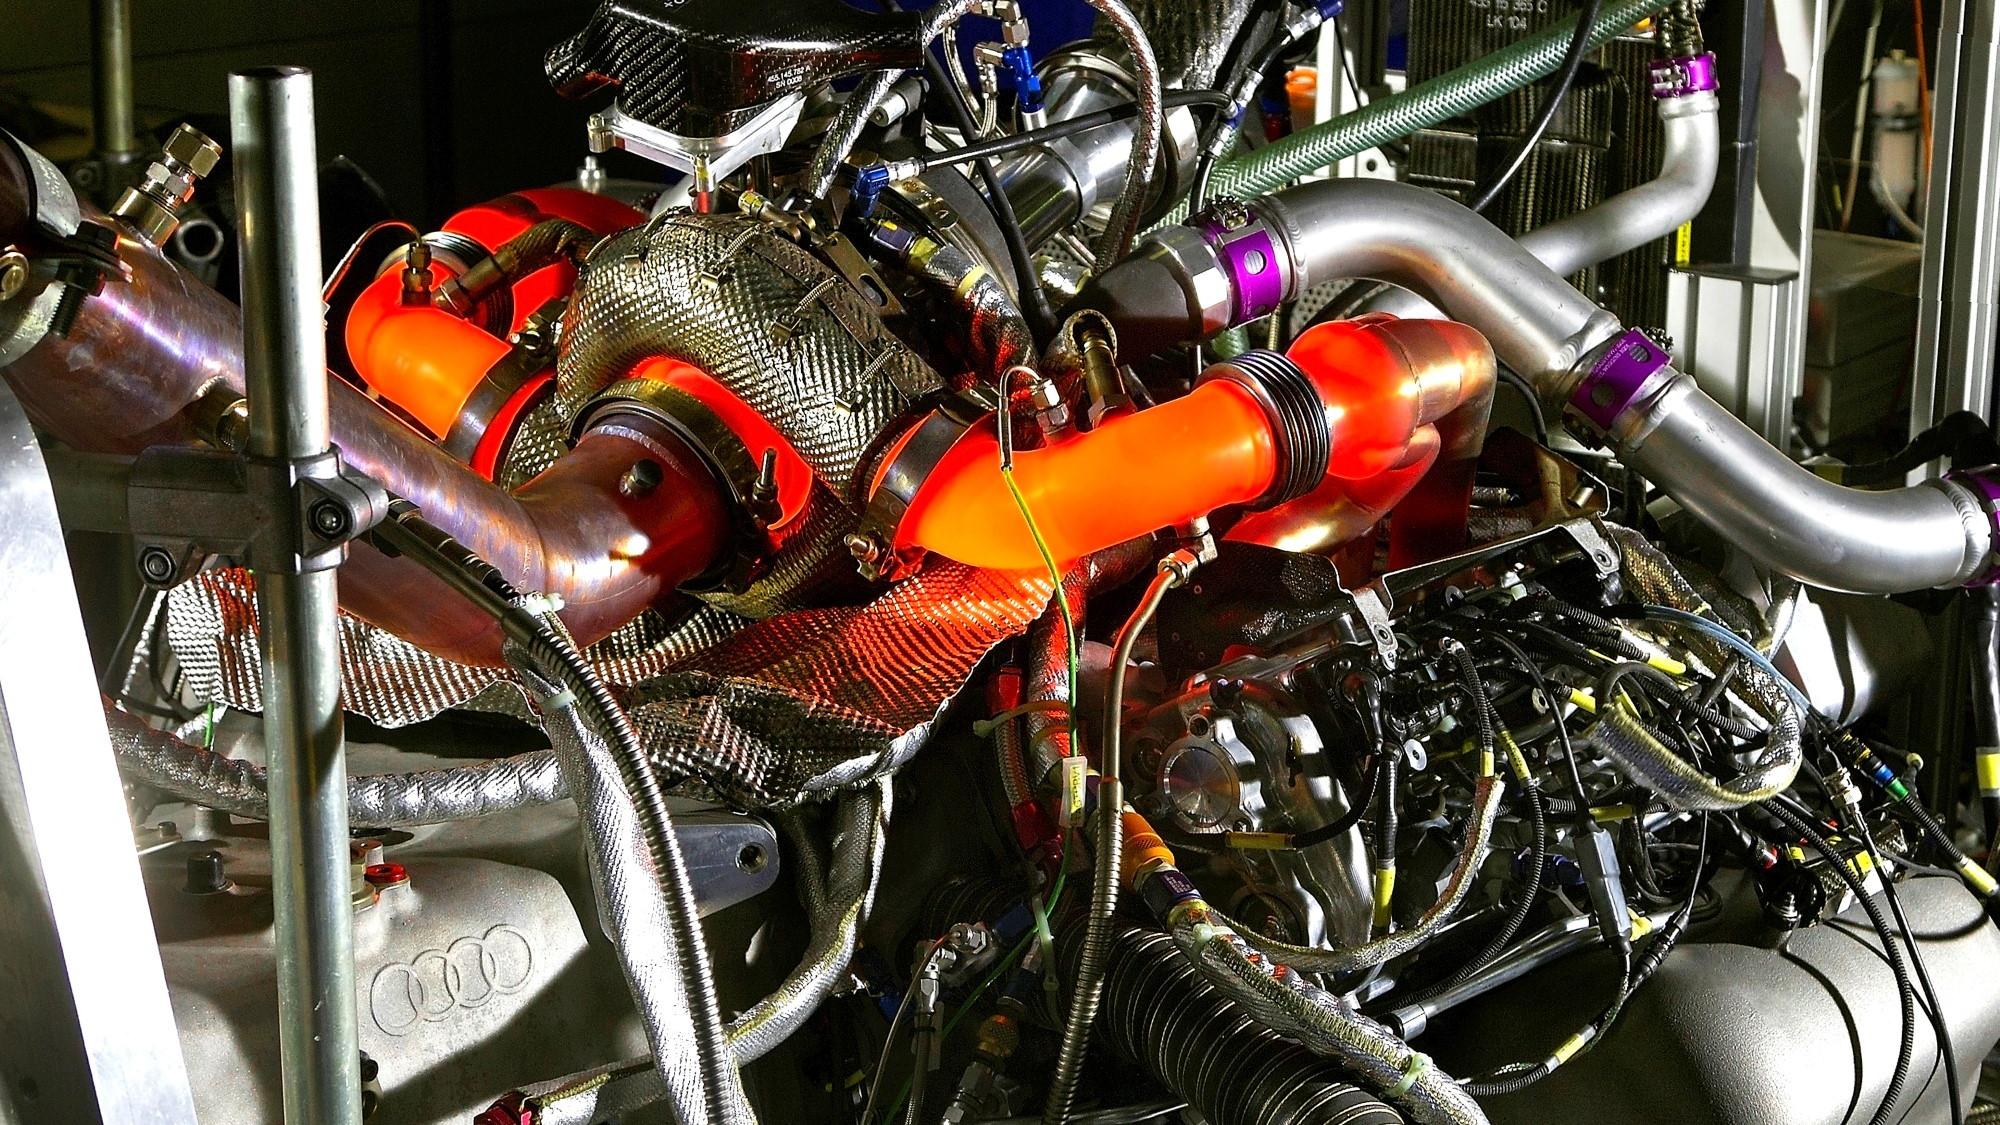 Audi racing yields production car technogloy benefits